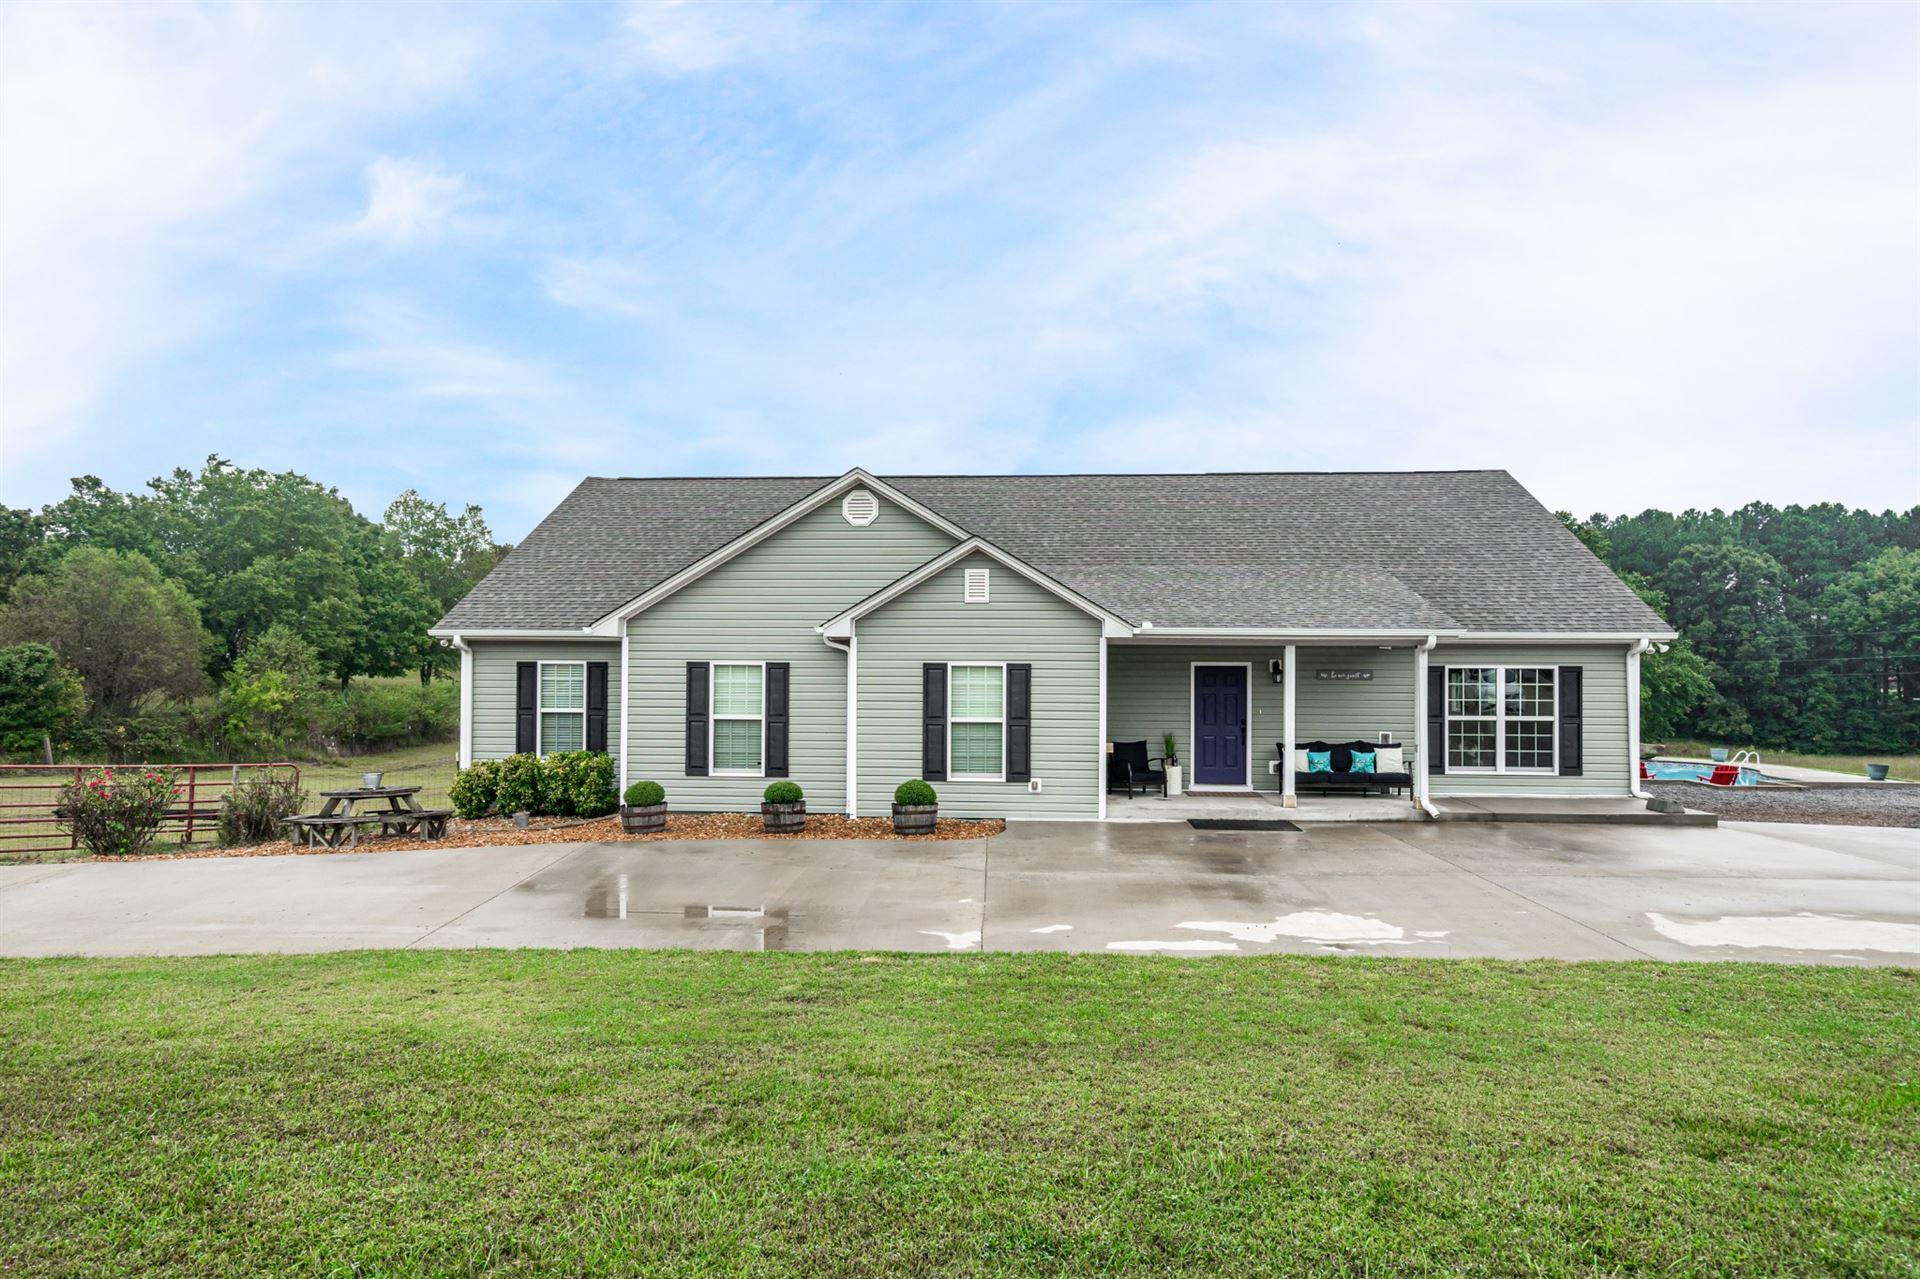 2770 N Hinton Rd, Clarksville, TN 37043 - MLS#: 2186927